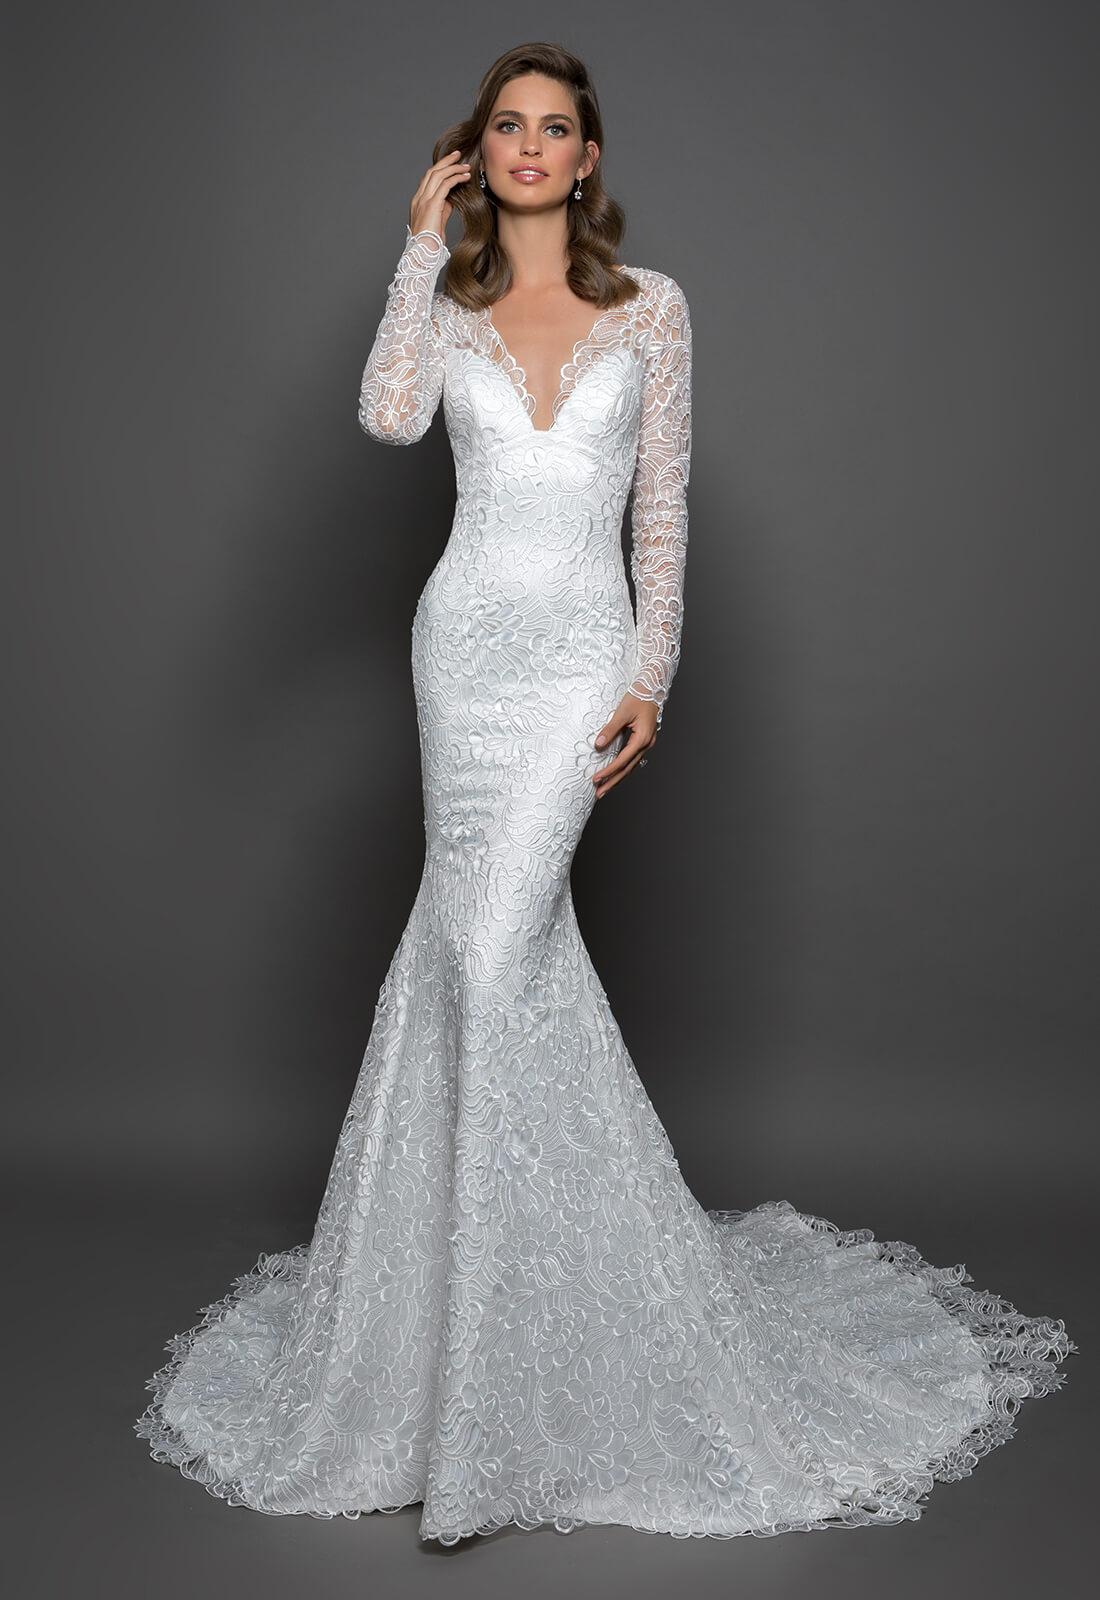 Lace Sheath Long Sleeve Dress With V-neckline | Kleinfeld Bridal